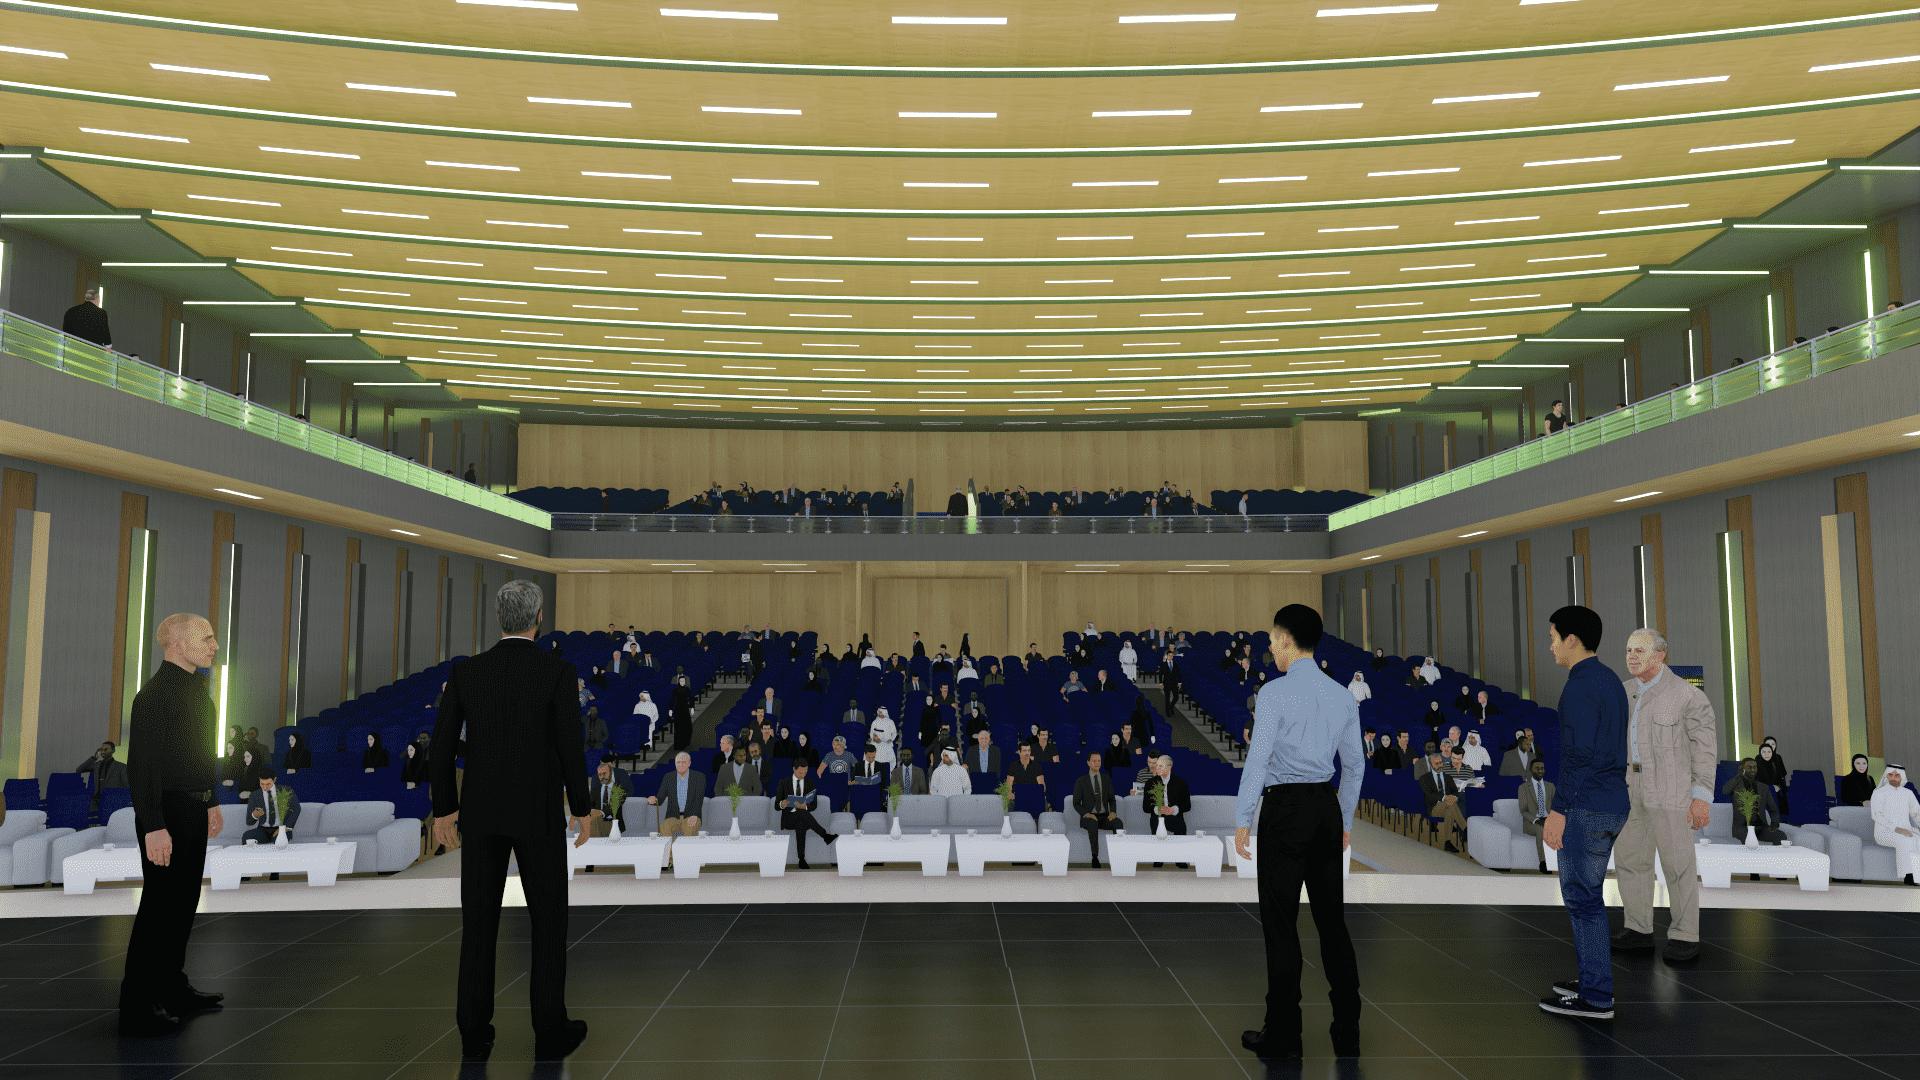 Pionner Architect Auditorium Poltekes Aceh Banda Aceh, Kota Banda Aceh, Aceh, Indonesia Banda Aceh, Kota Banda Aceh, Aceh, Indonesia Panggung Kontemporer  43381